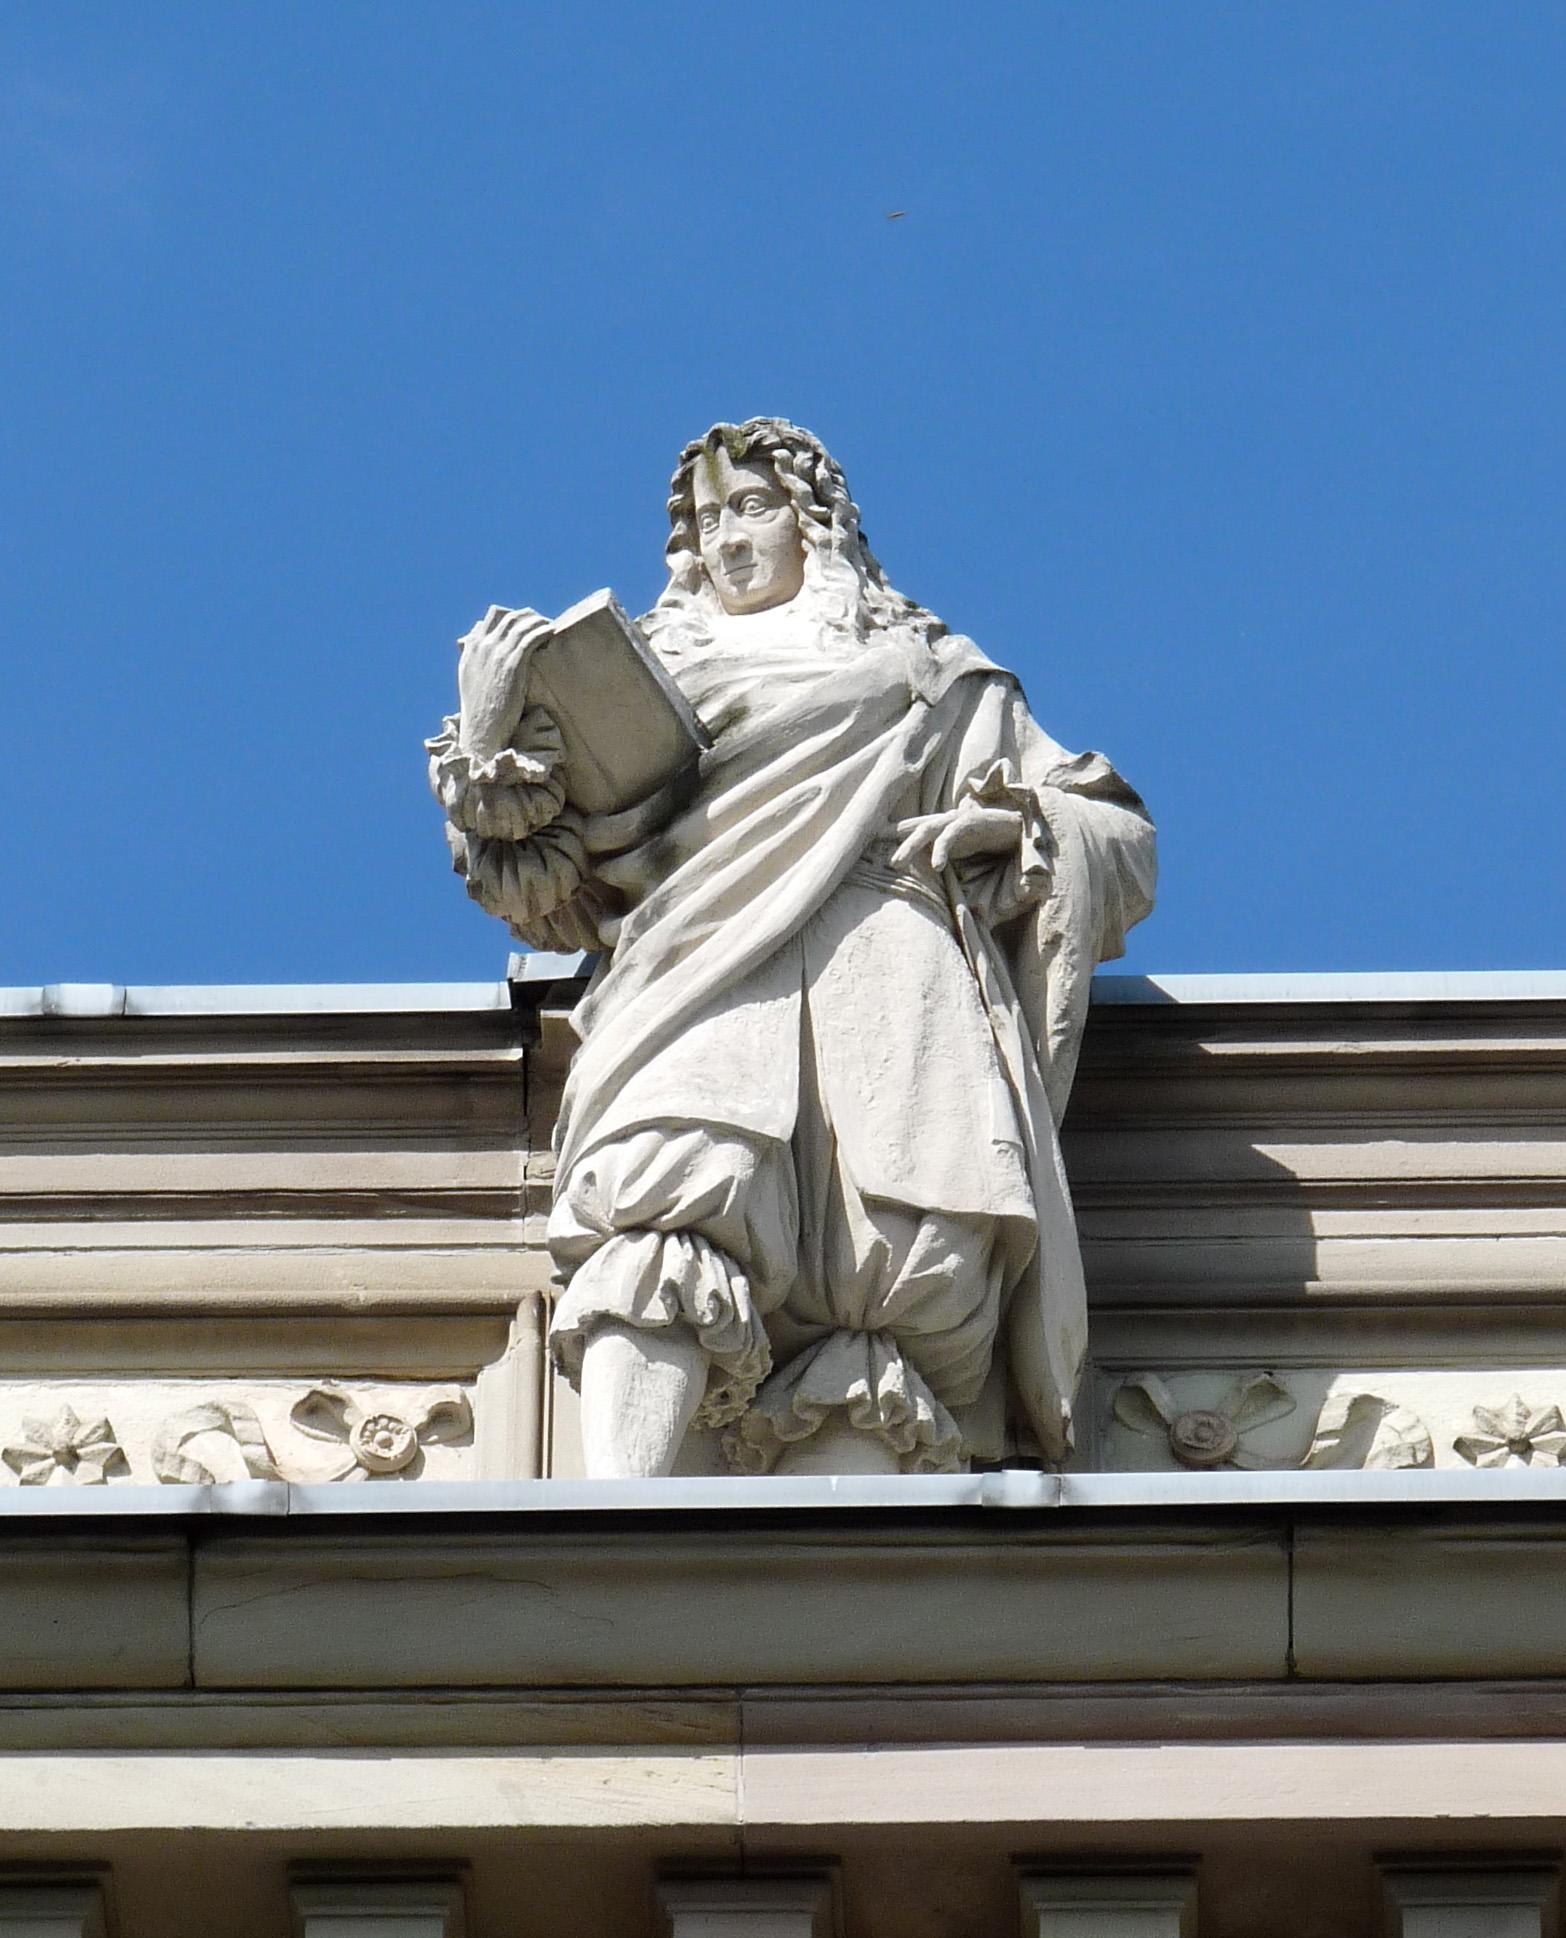 Statue of Pufendorf on the [[Palais Universitaire, Strasbourg